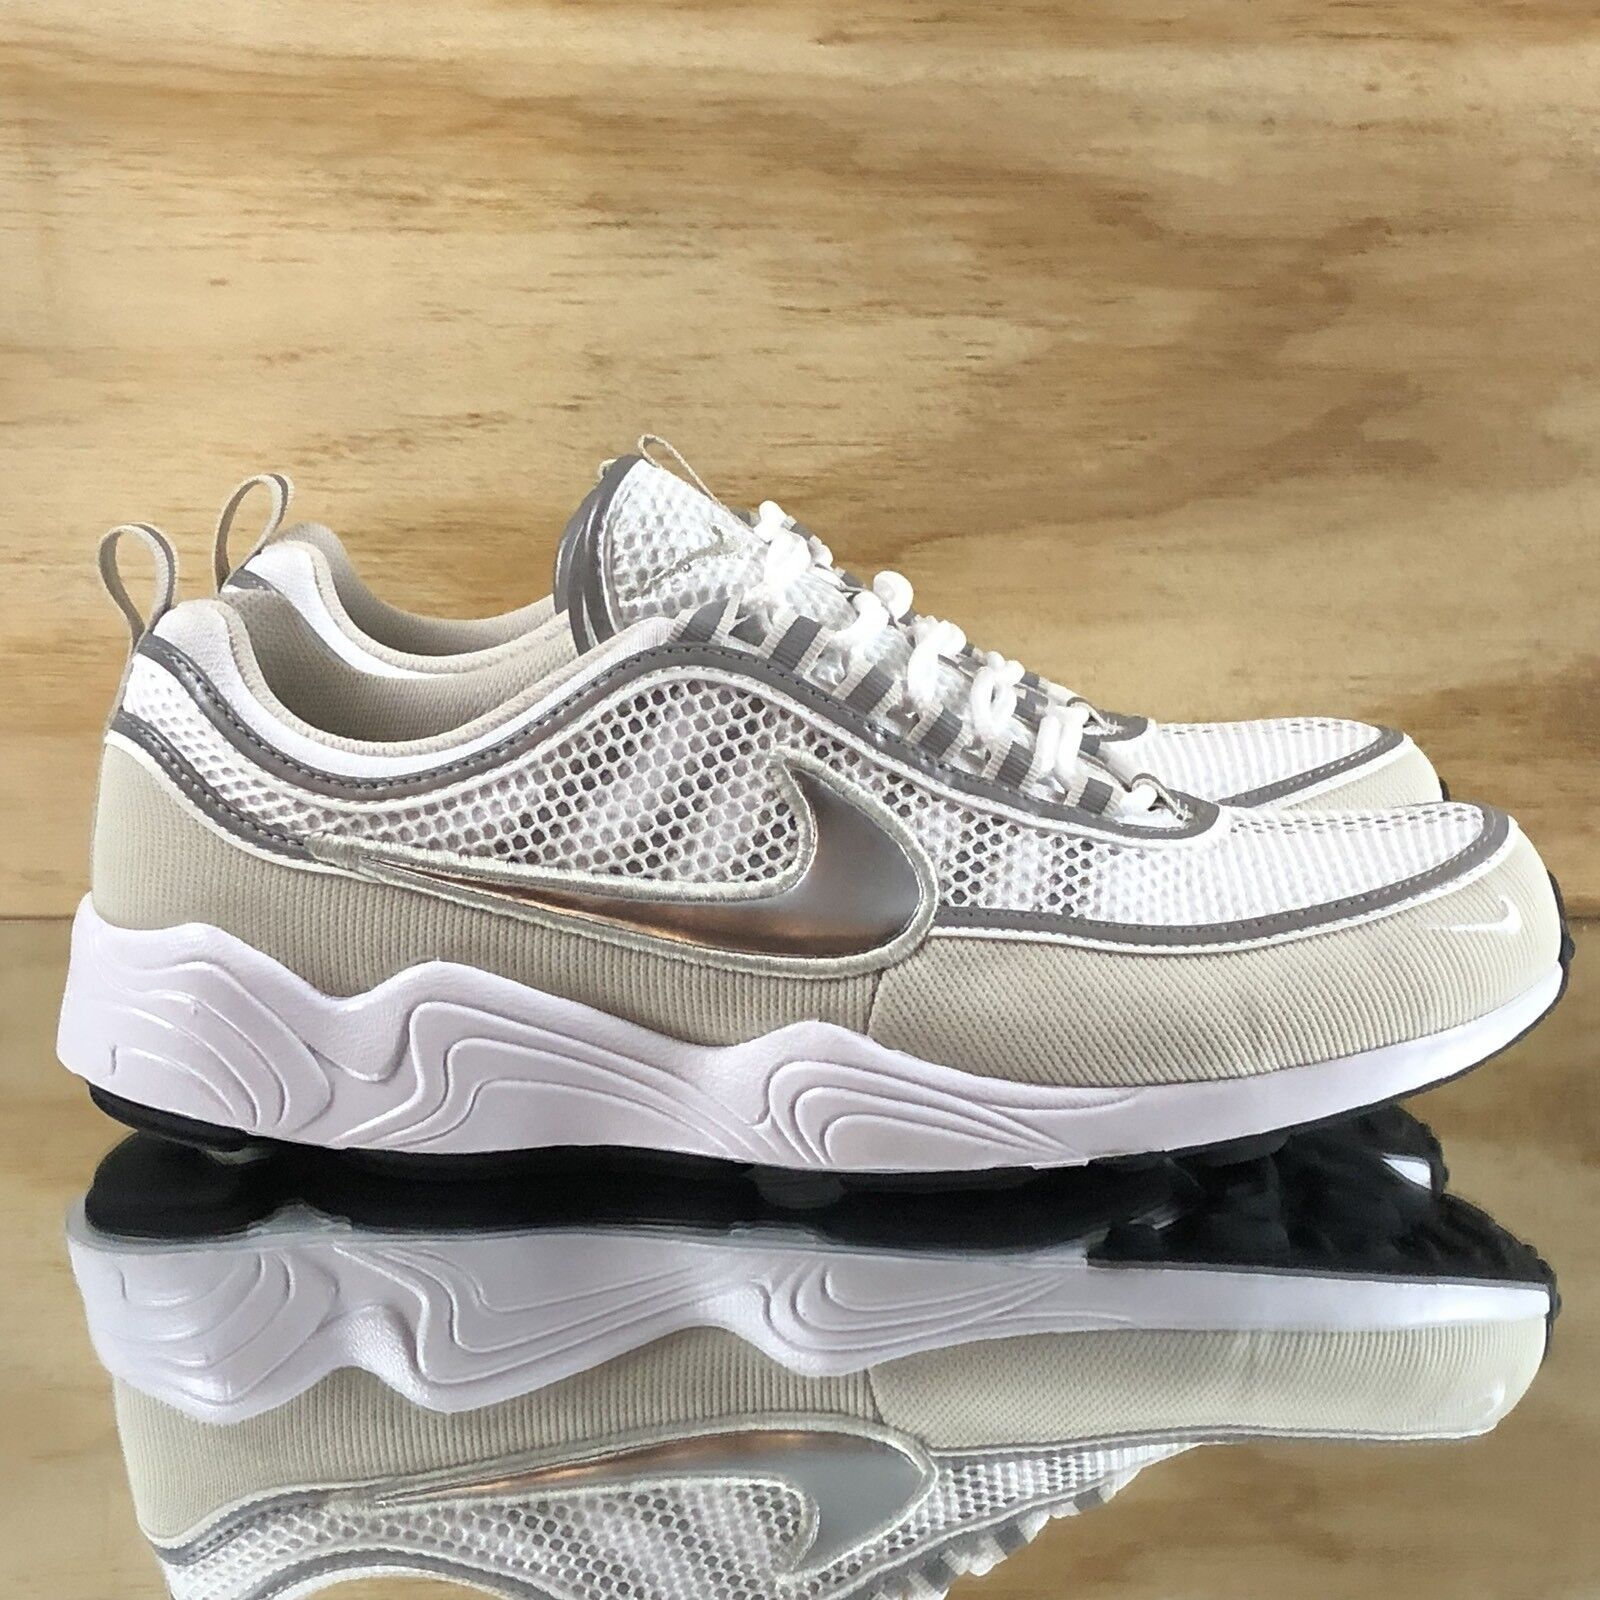 Nike Air Zoom Spiridon '16 White Metallic Silver Bone Grey 926955-105 Multi Size